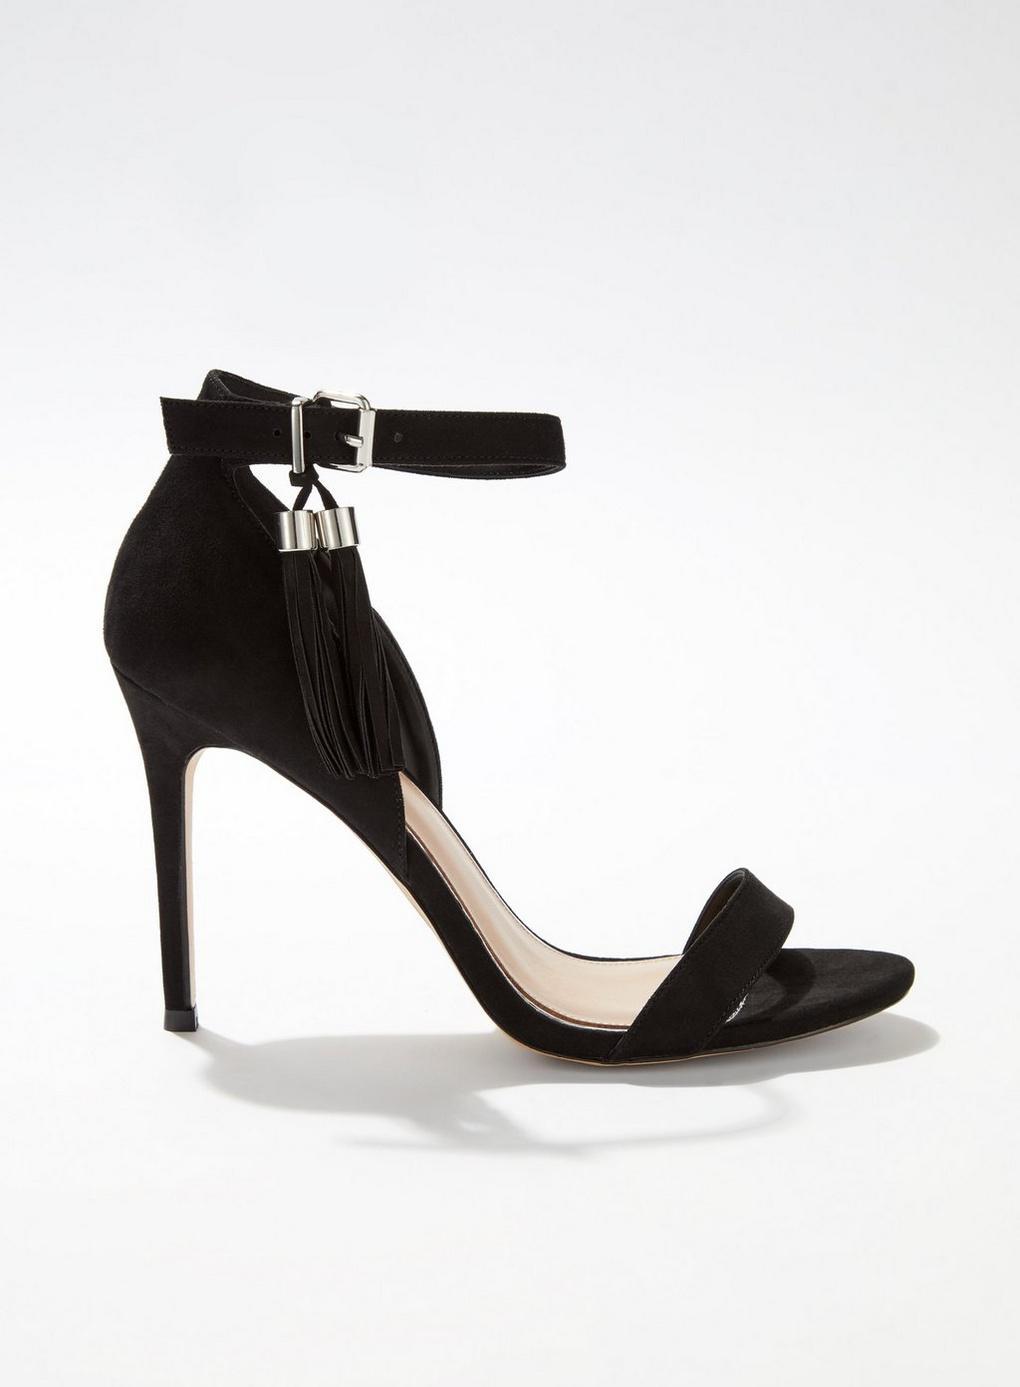 cba6f282bf24 Lyst - Miss Selfridge Hara Tassel Stiletto Heel in Black